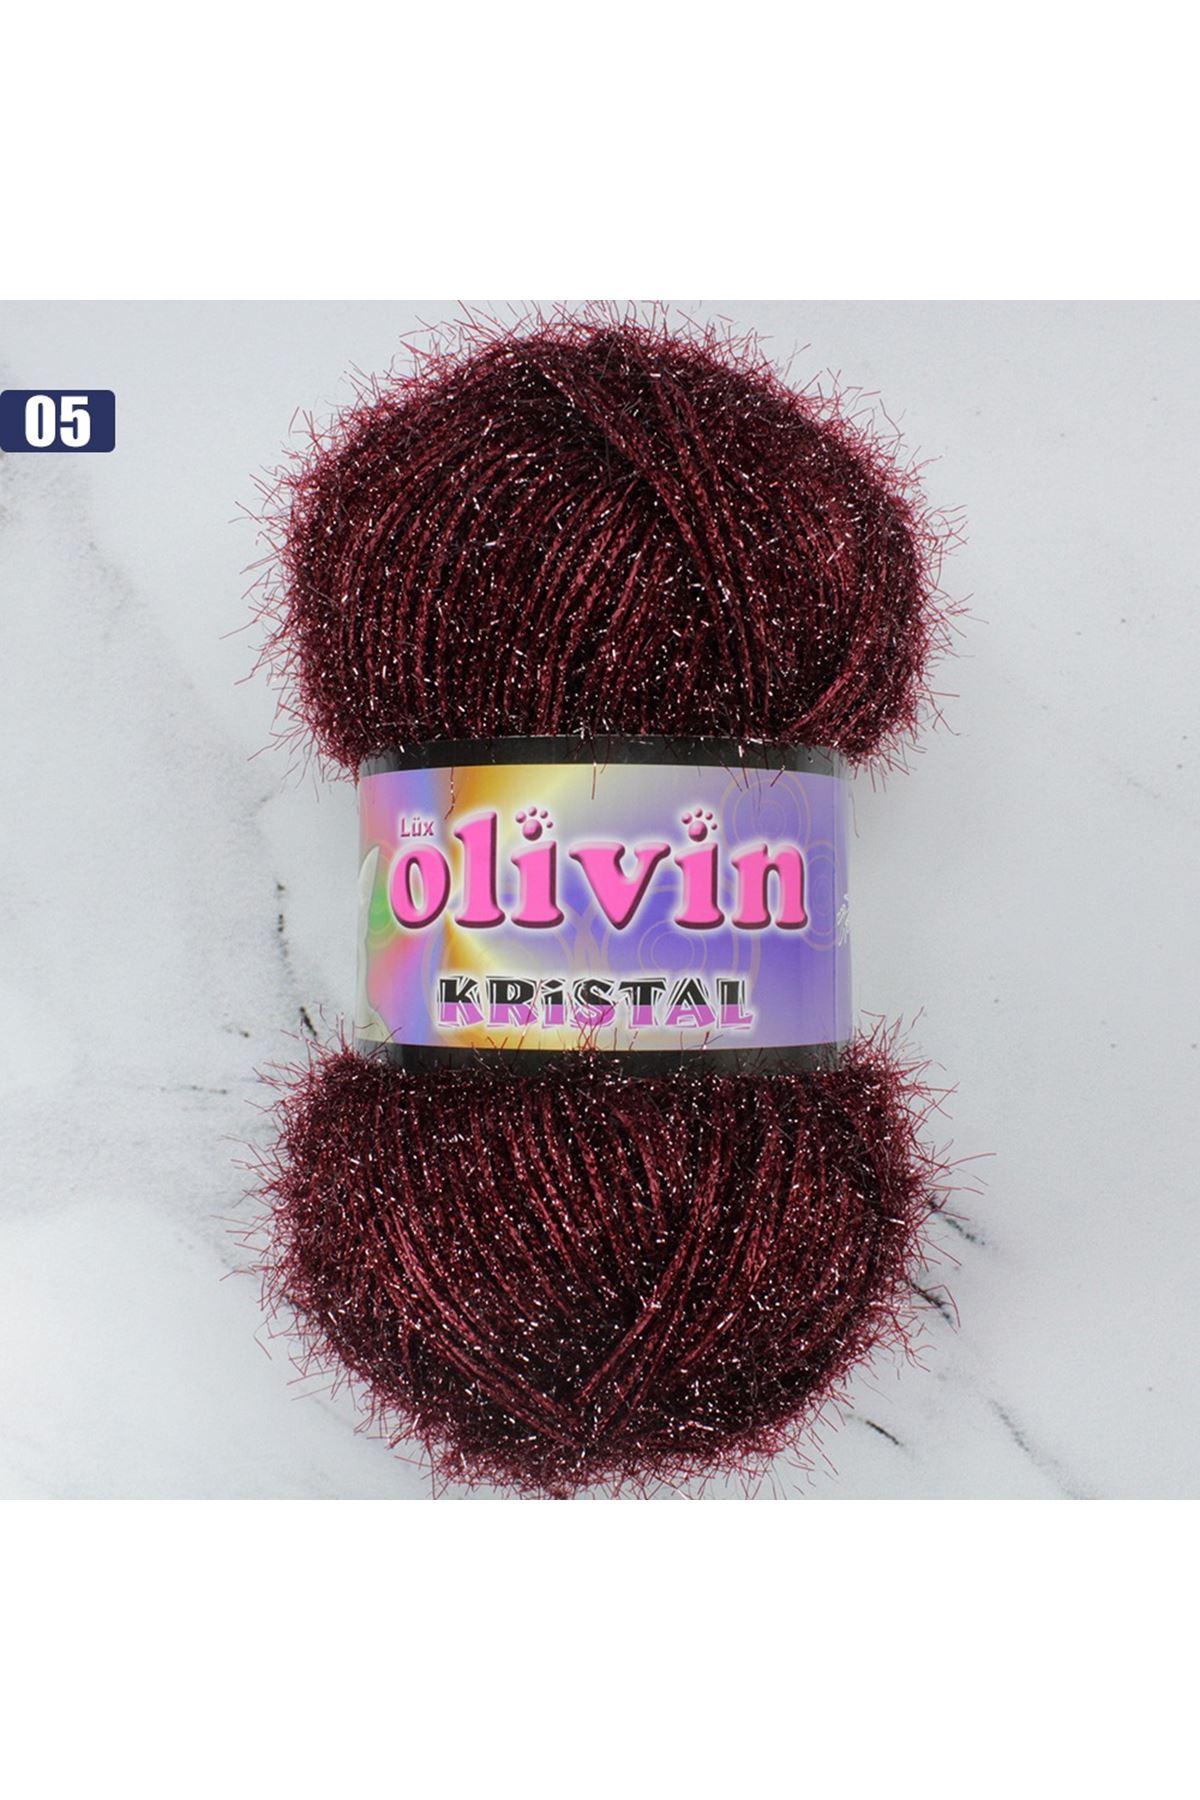 Olivin Simli Kristal  - 05